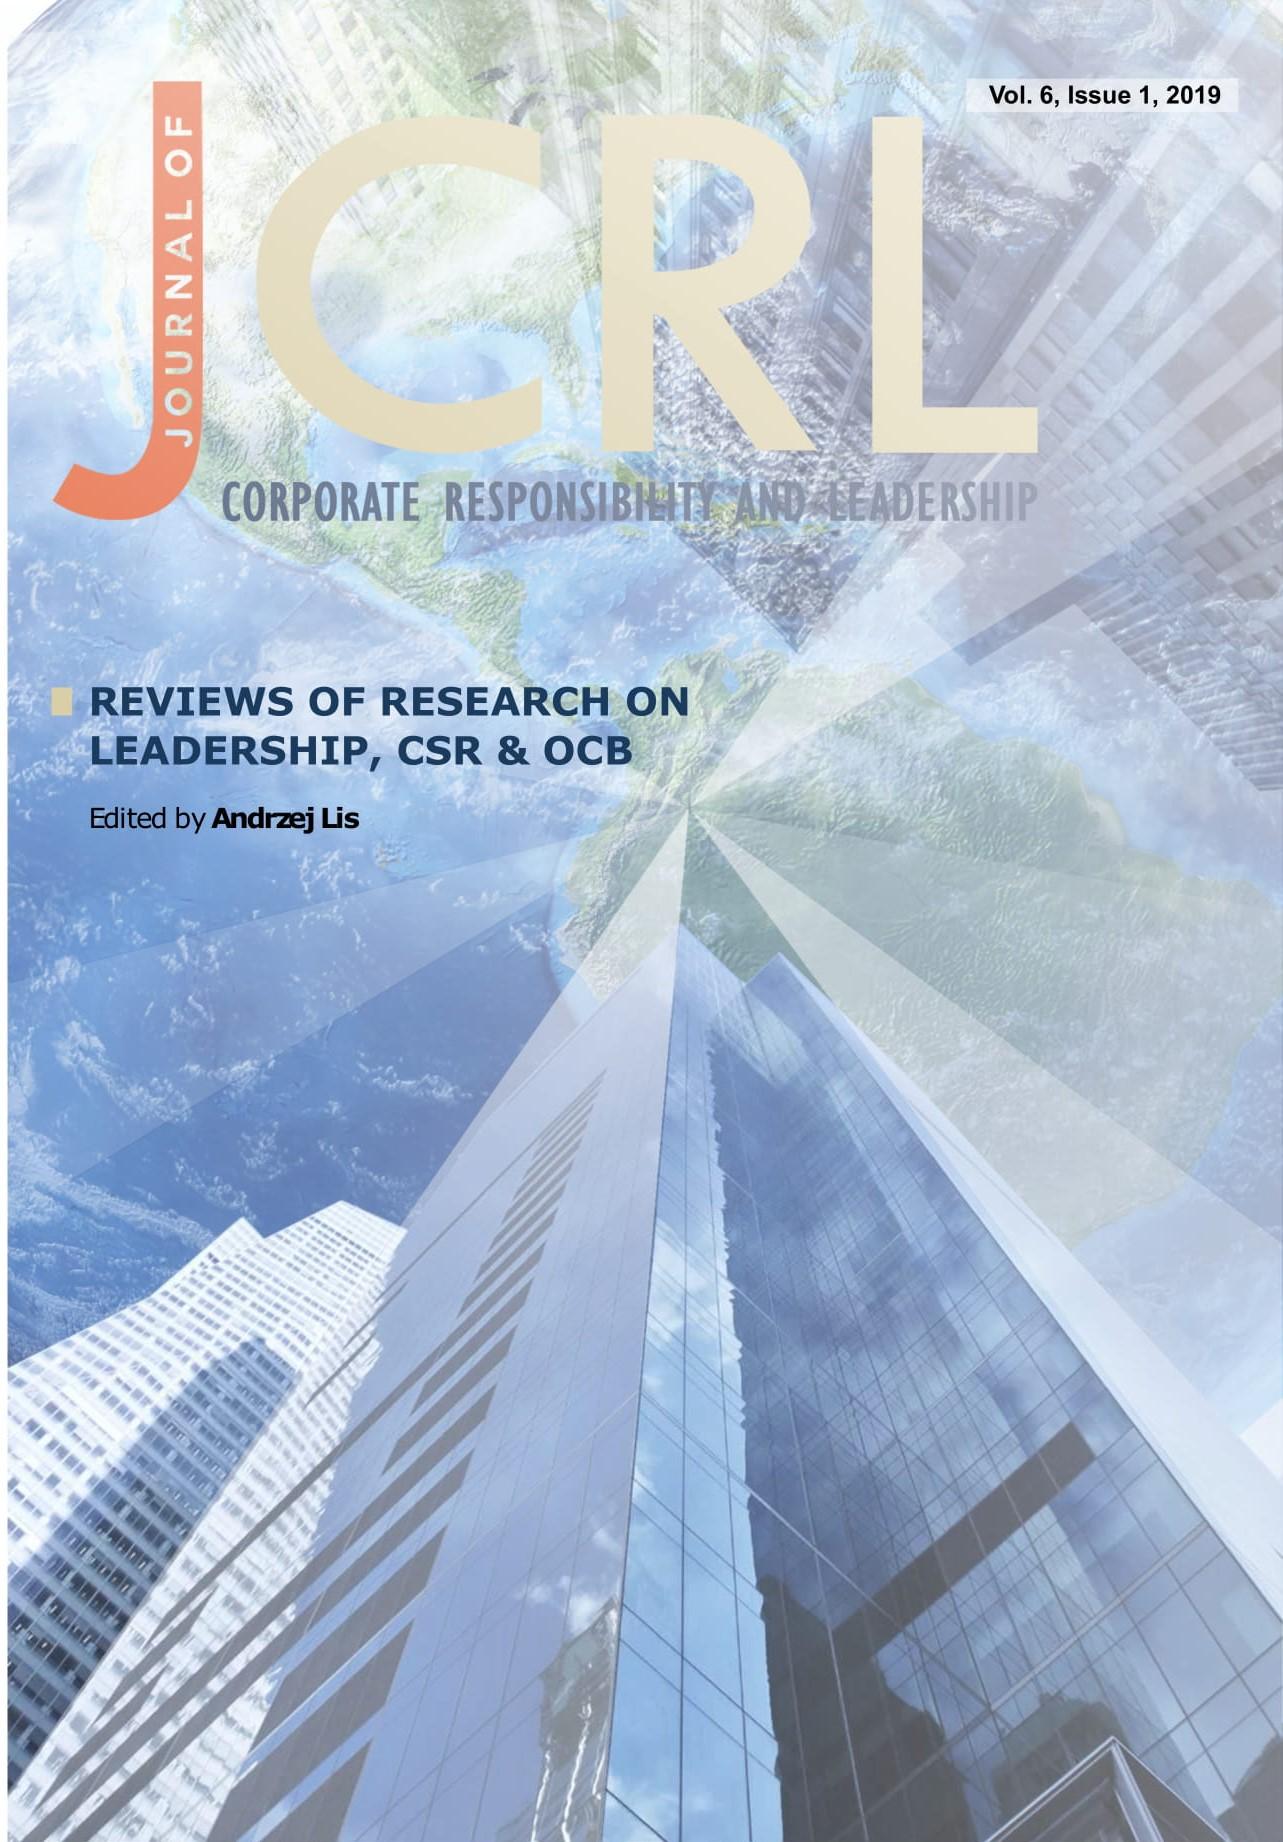 View Vol. 6 No. 1 (2019): Reviews of Research on Leadership, CSR & OCB